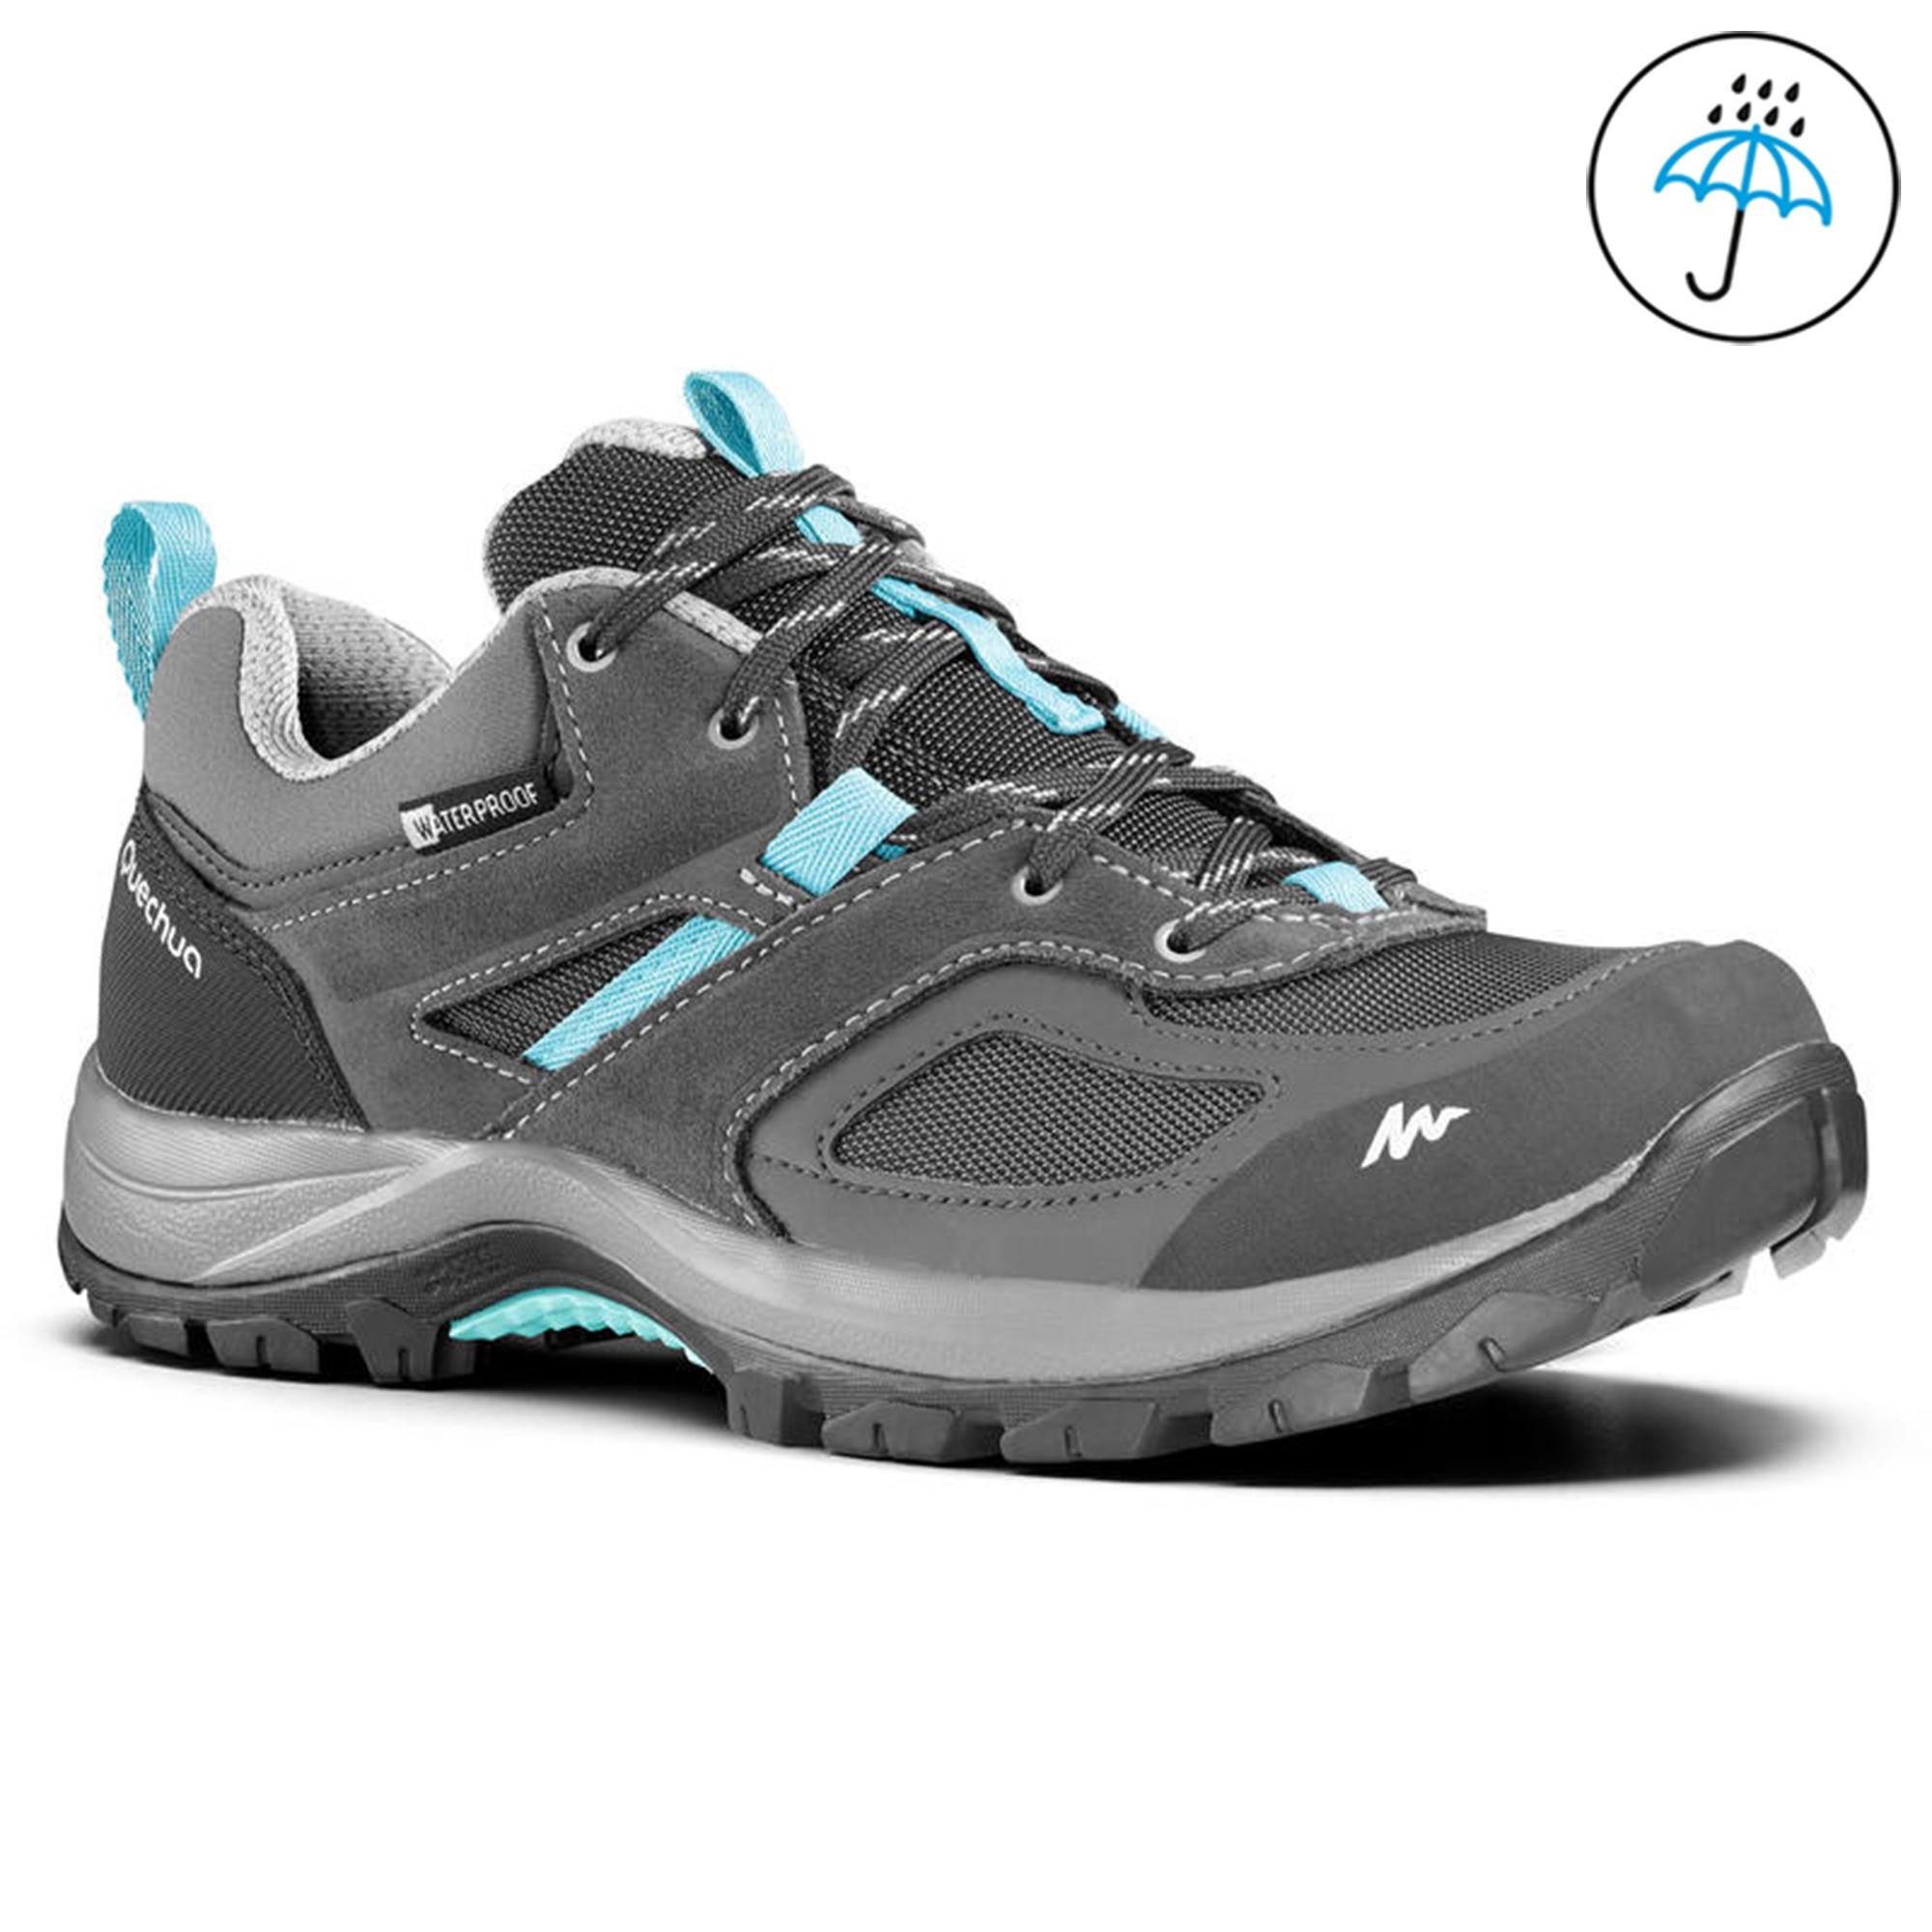 MH100 Buy Quechua Hiking Shoes for Women